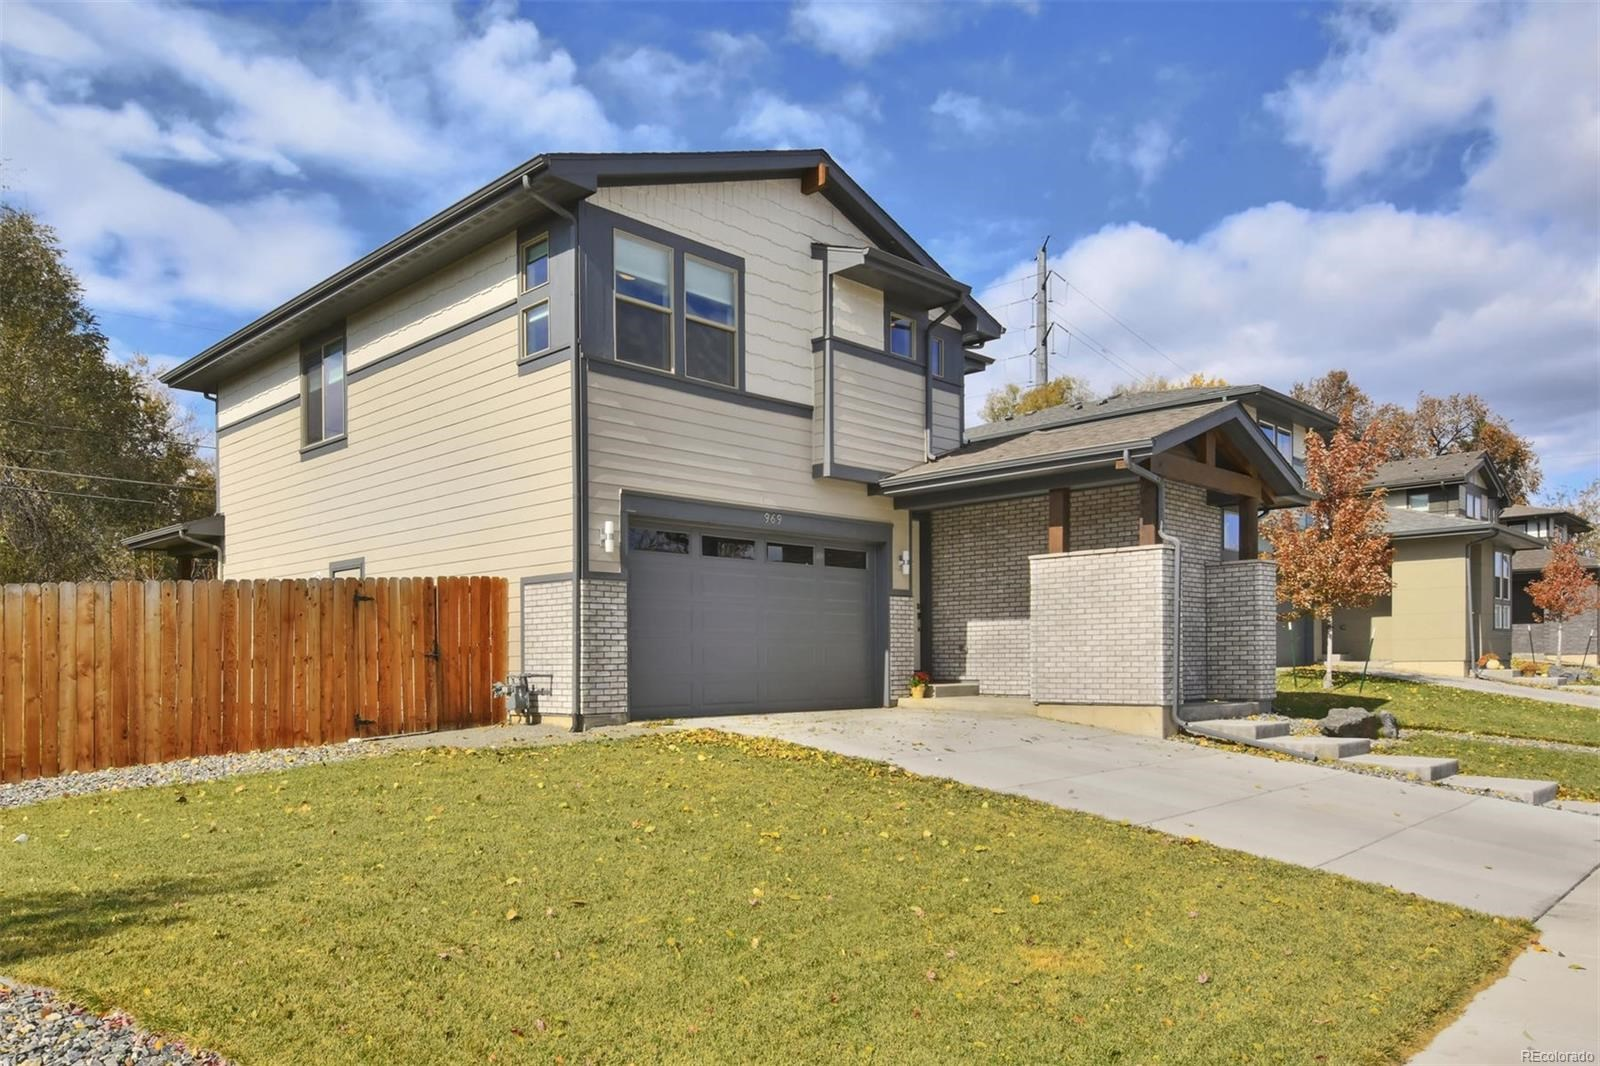 MLS# 2568823 - 2 - 969 Eaton Street, Lakewood, CO 80214